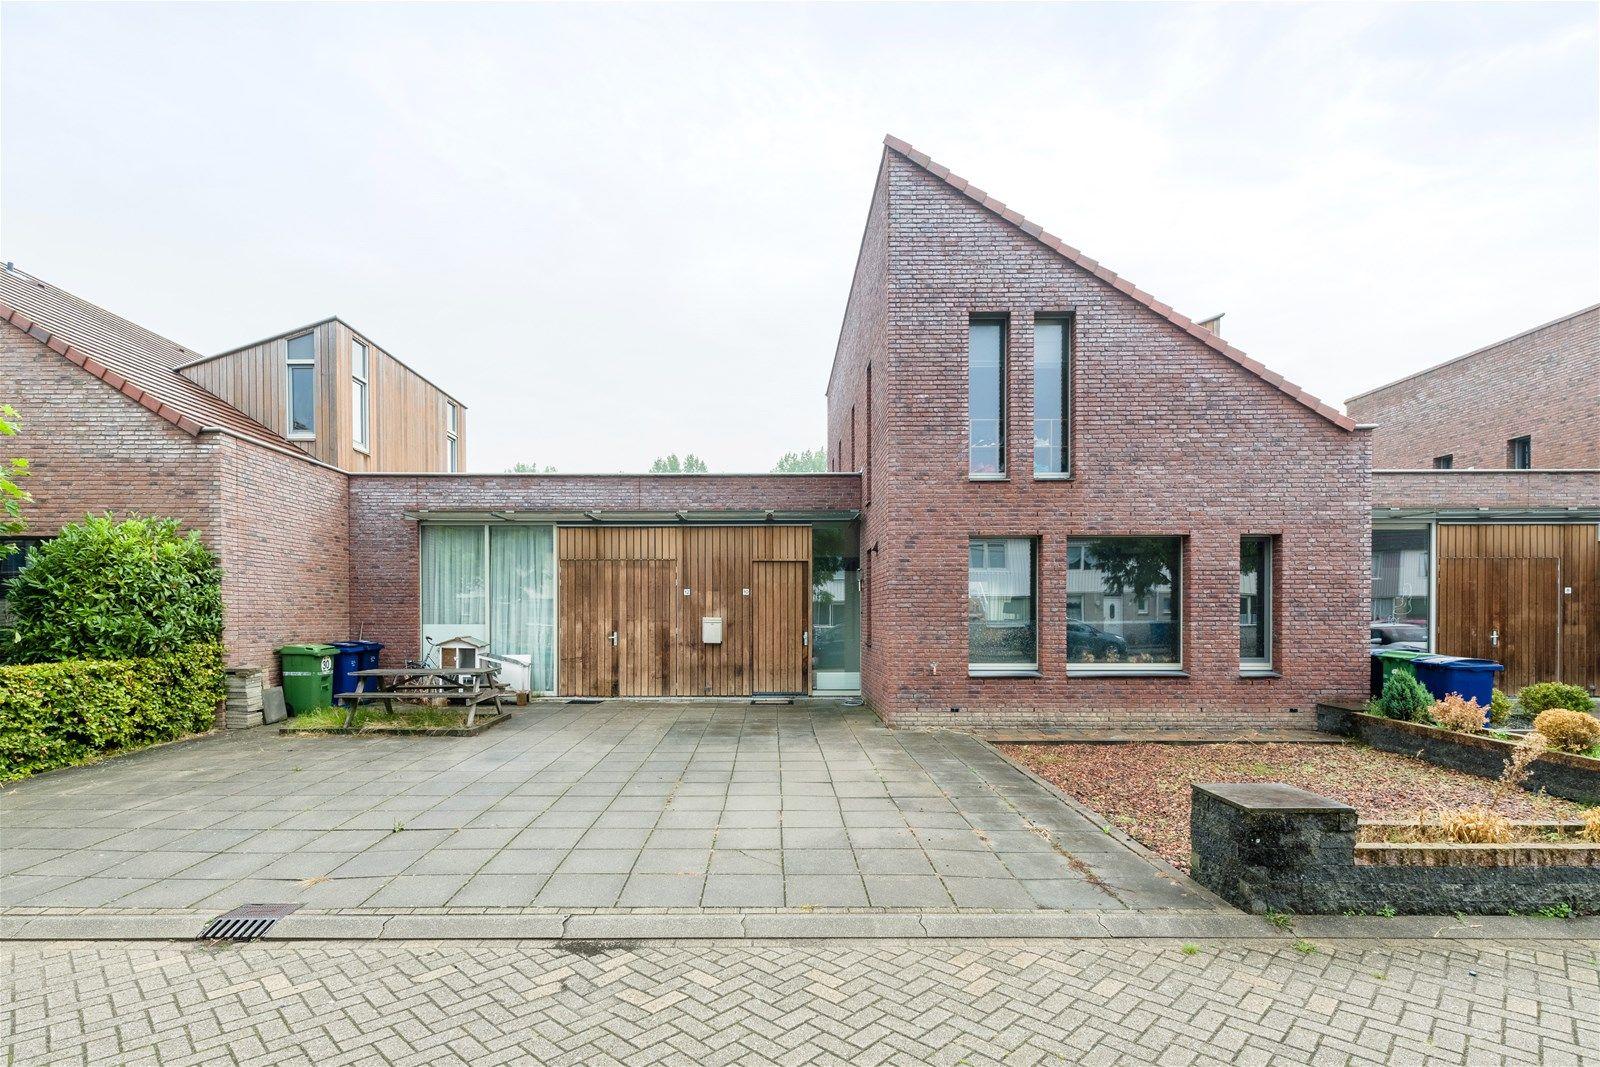 W.M. Dudokstraat 10, Almere